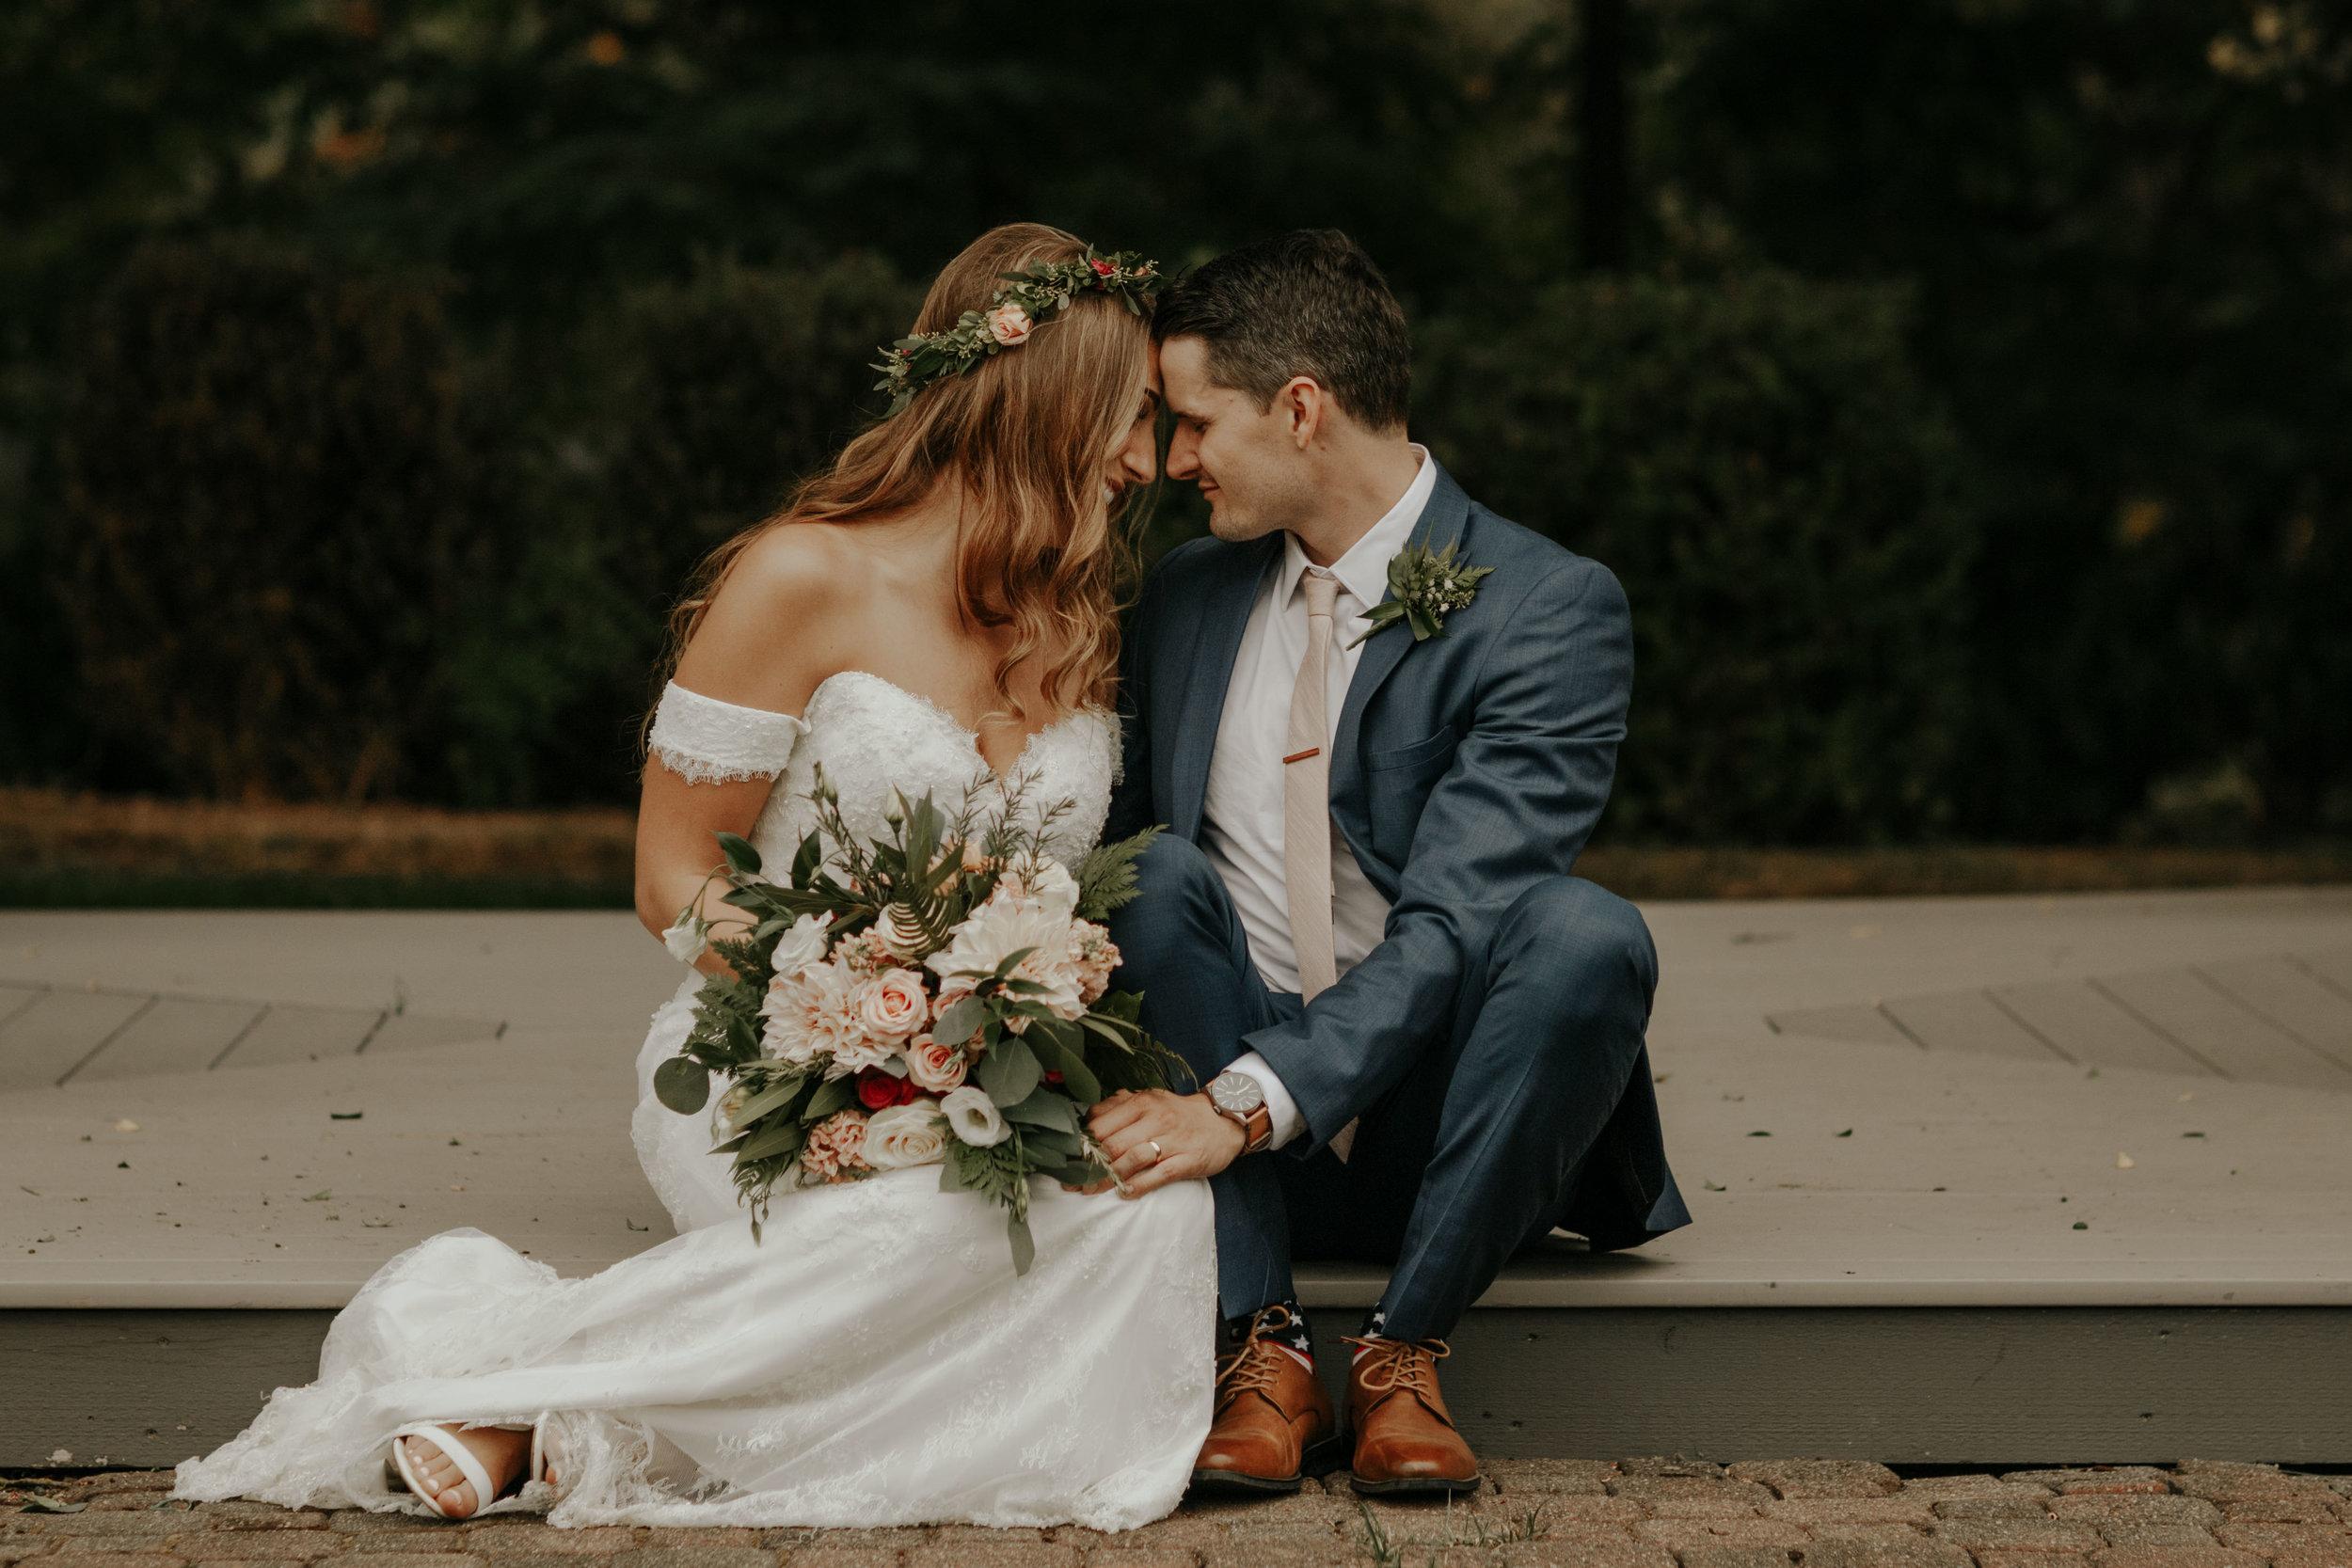 ginapaulson_jakitrevor_wedding-744.jpg